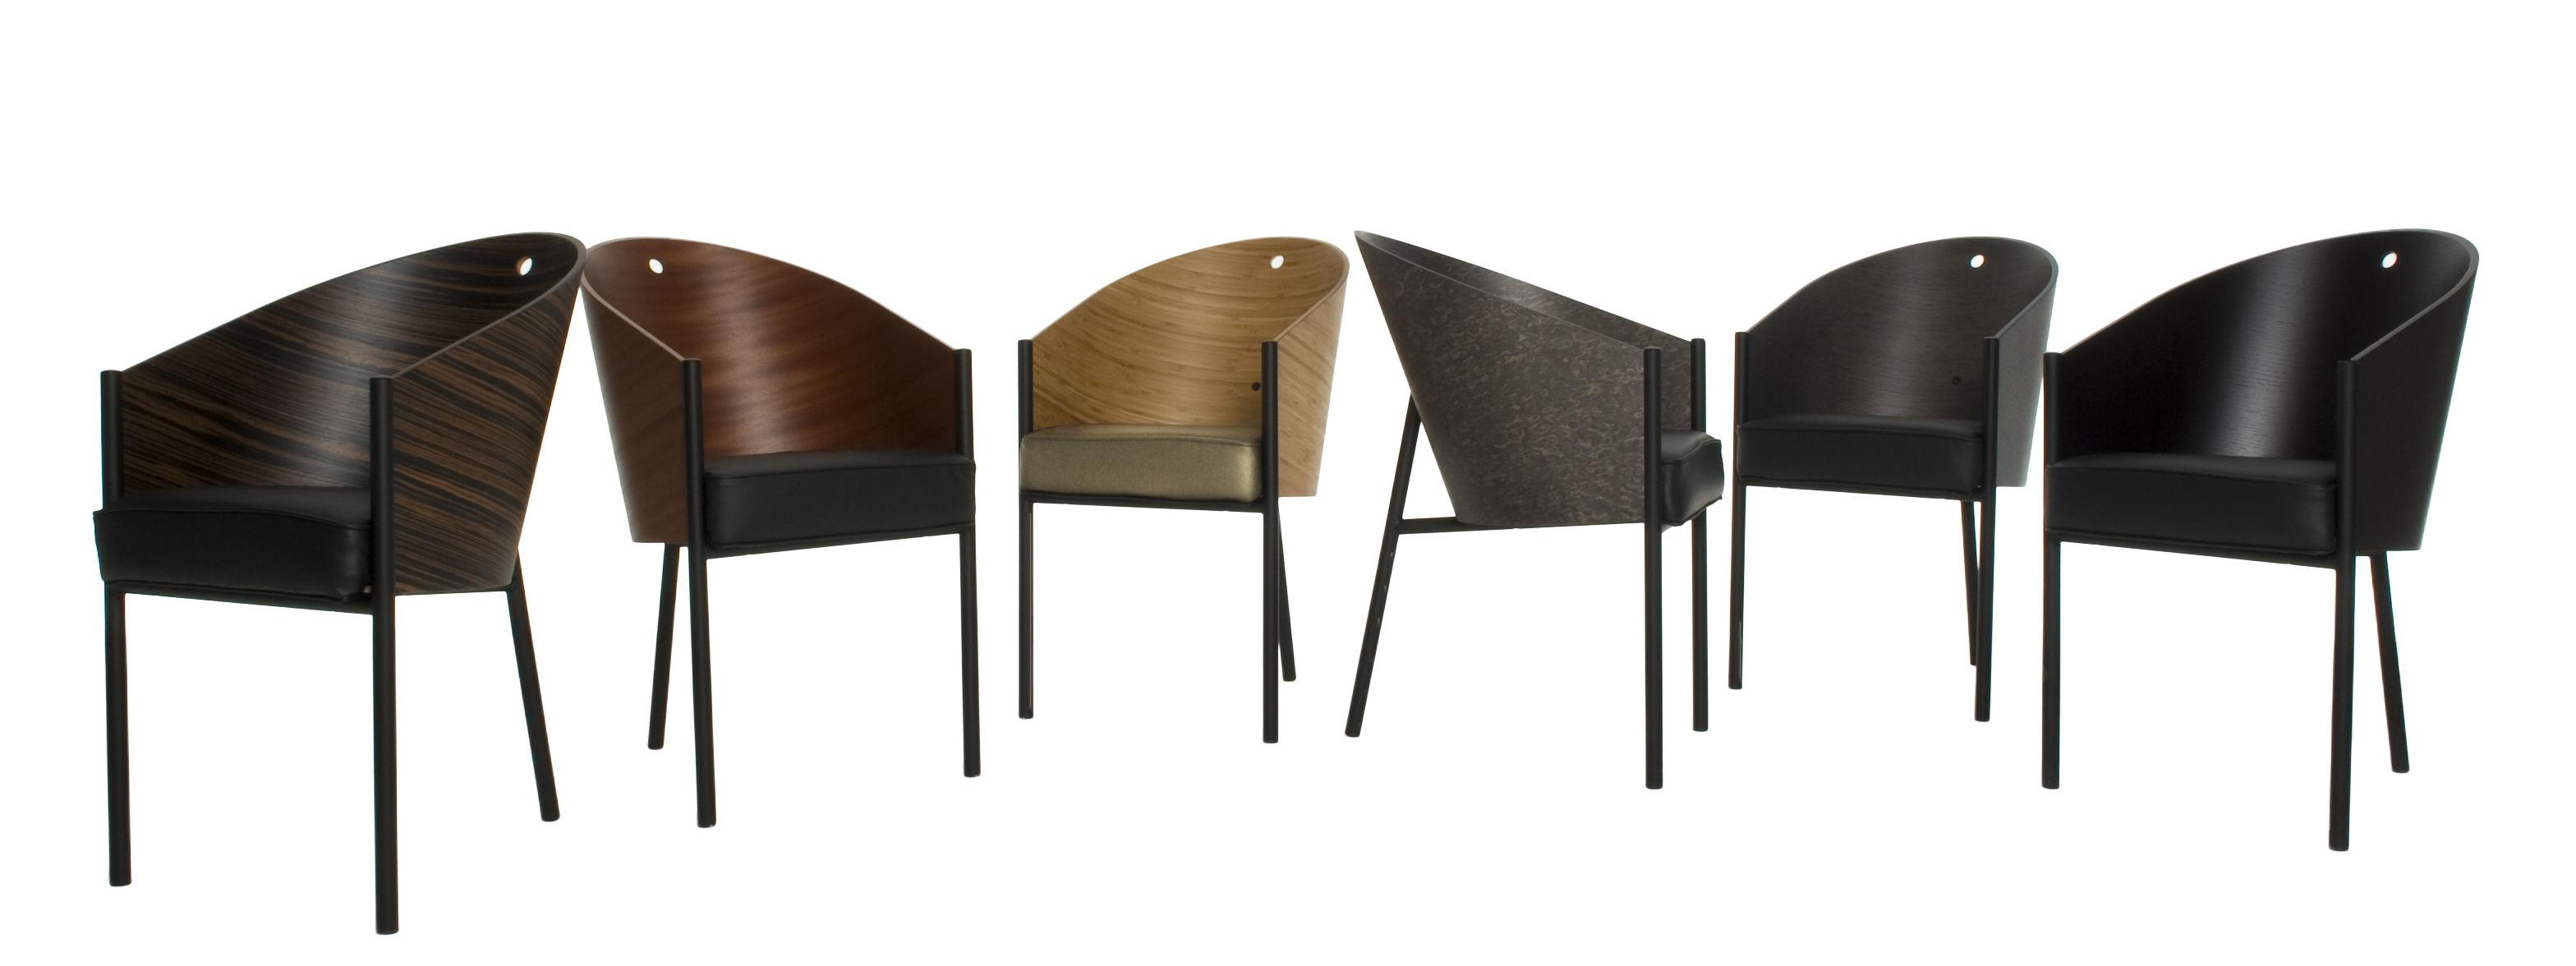 Arredamento - Poltrone design  - Poltrona Costes di Driade - Bambù / Gambe nere - Acciaio verniciato, Bambù